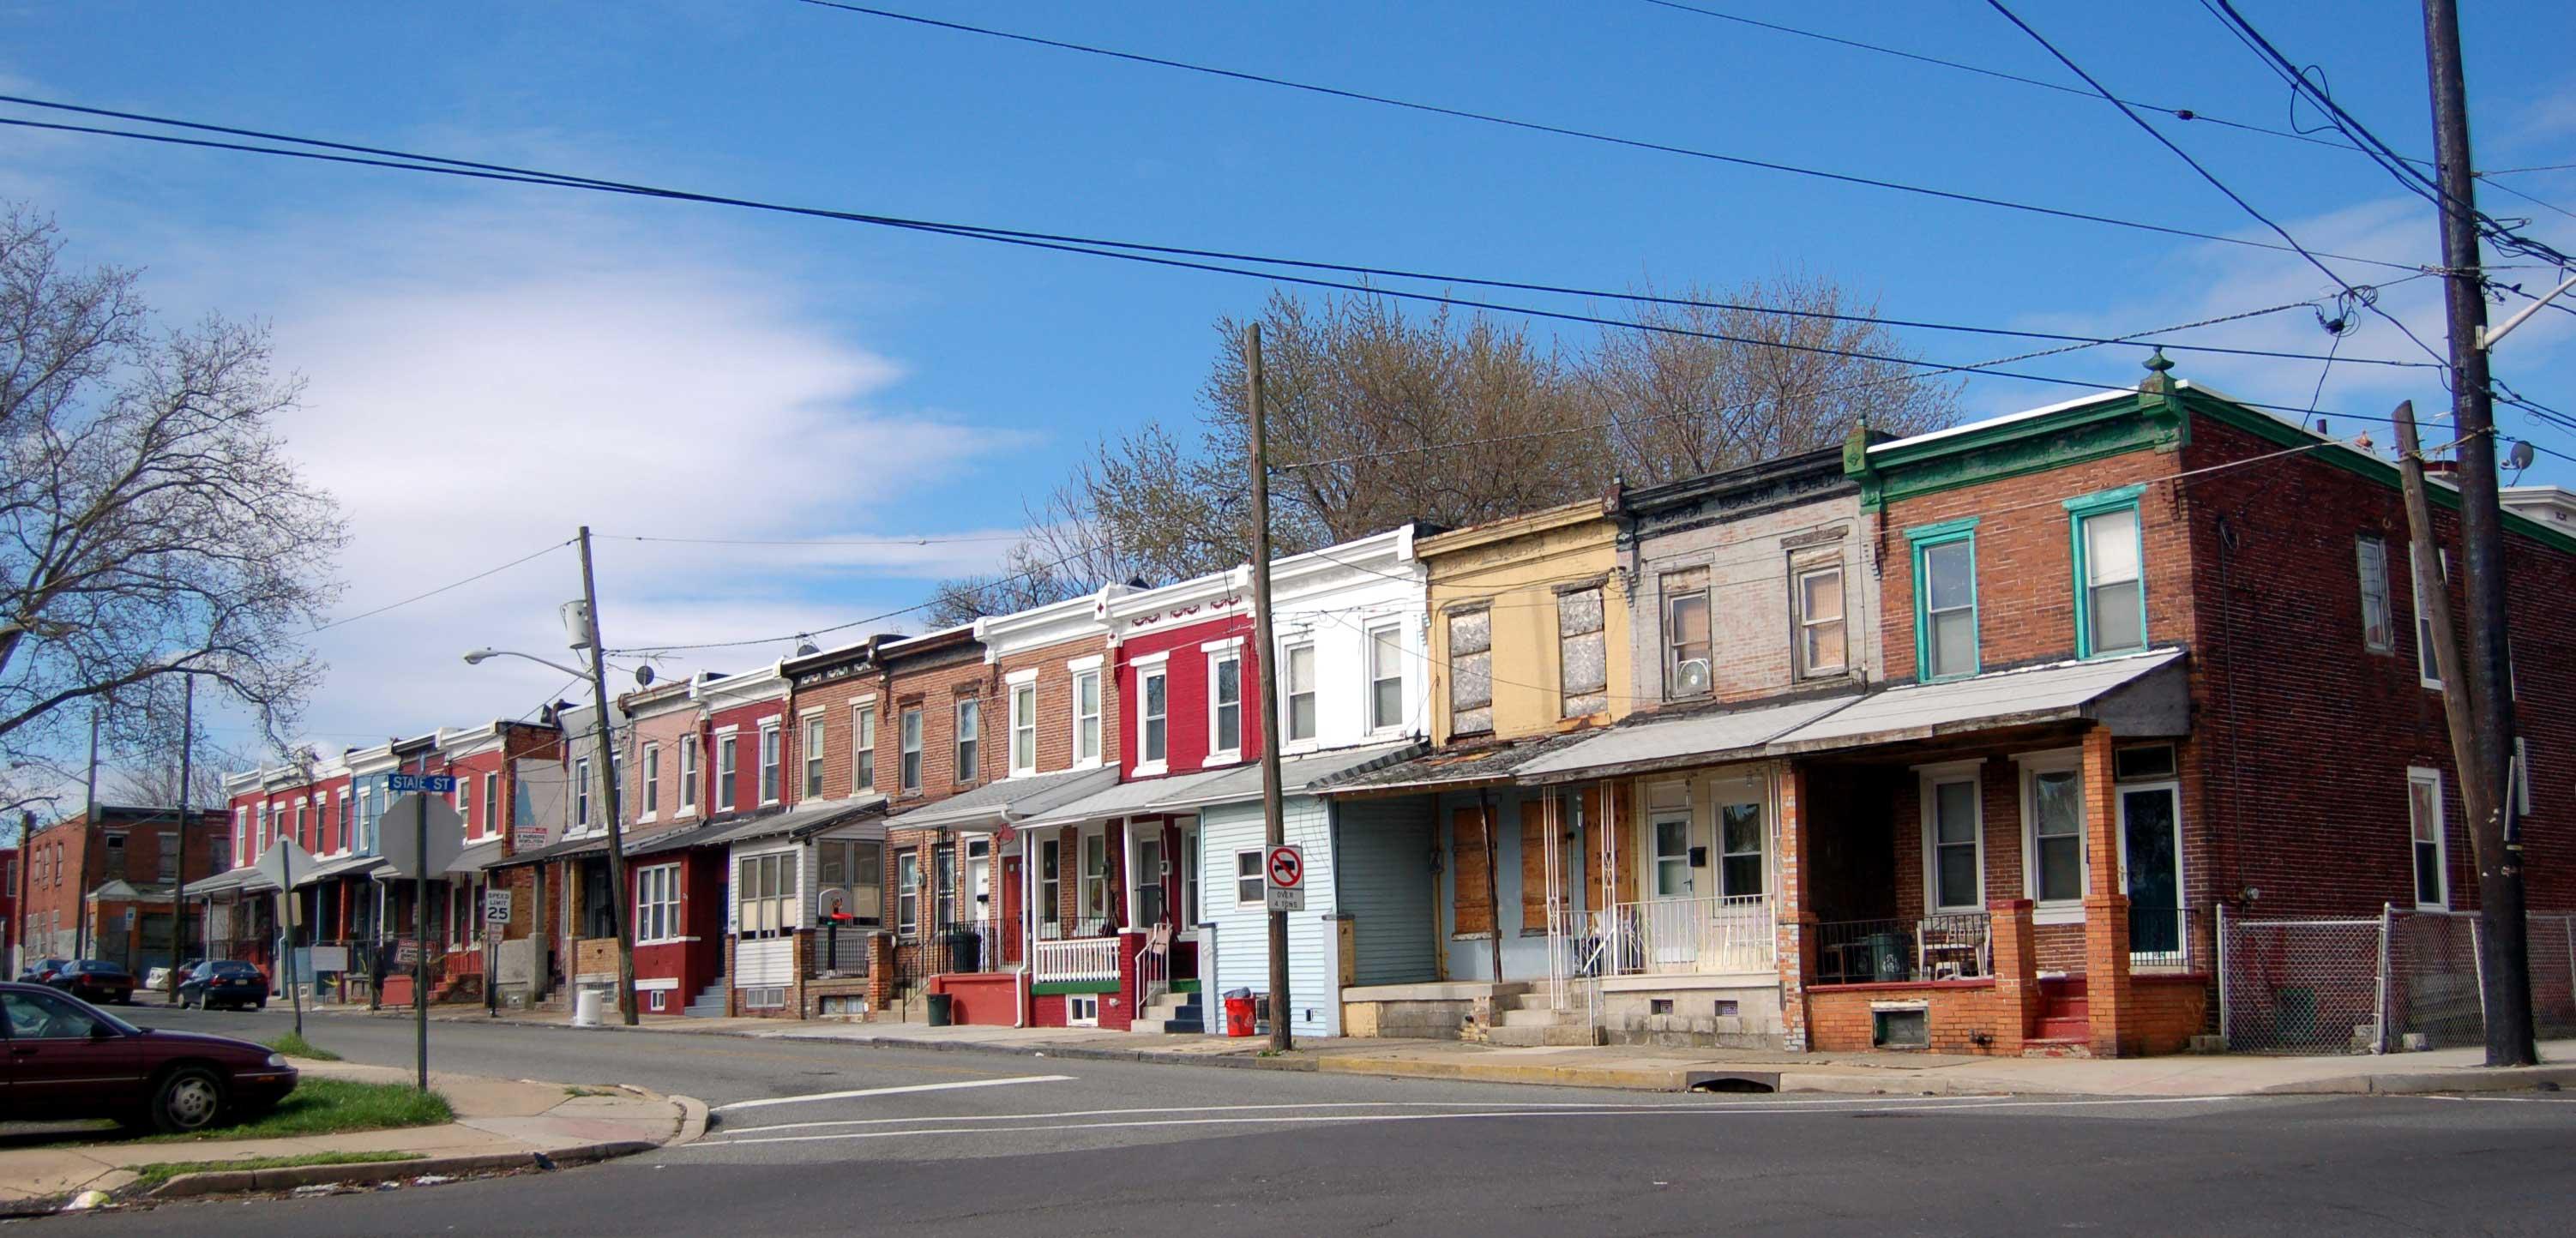 Camden Streets 10th Street